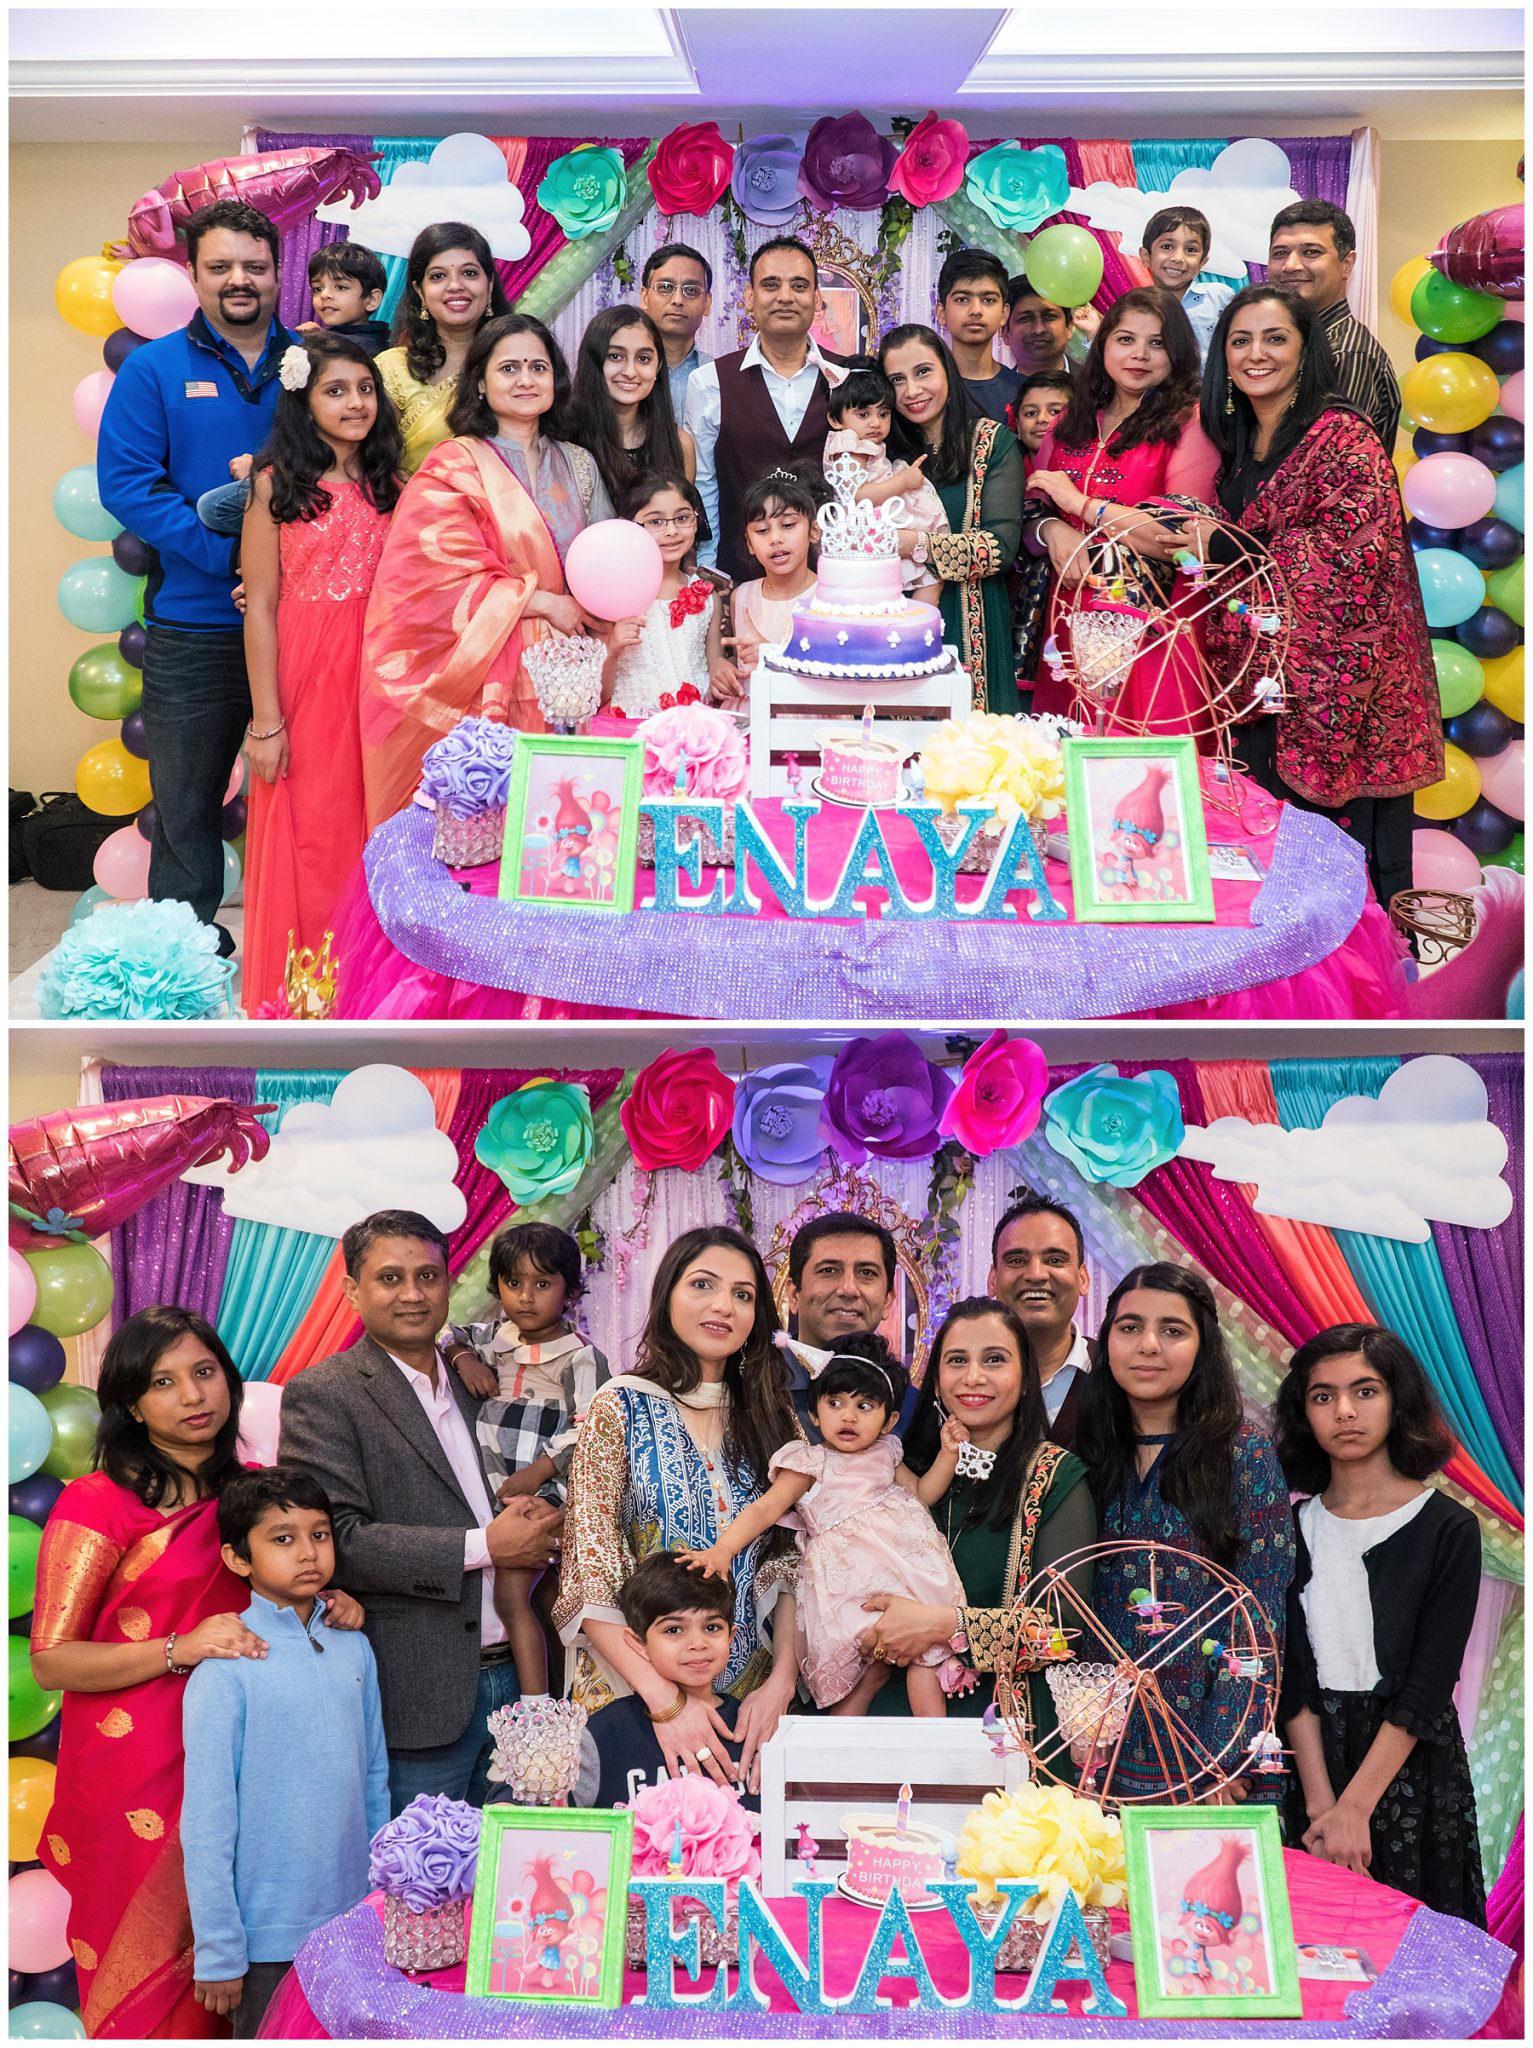 deewan-banquet-piscataway-nj-birthday-enanya-birthday-25.jpg